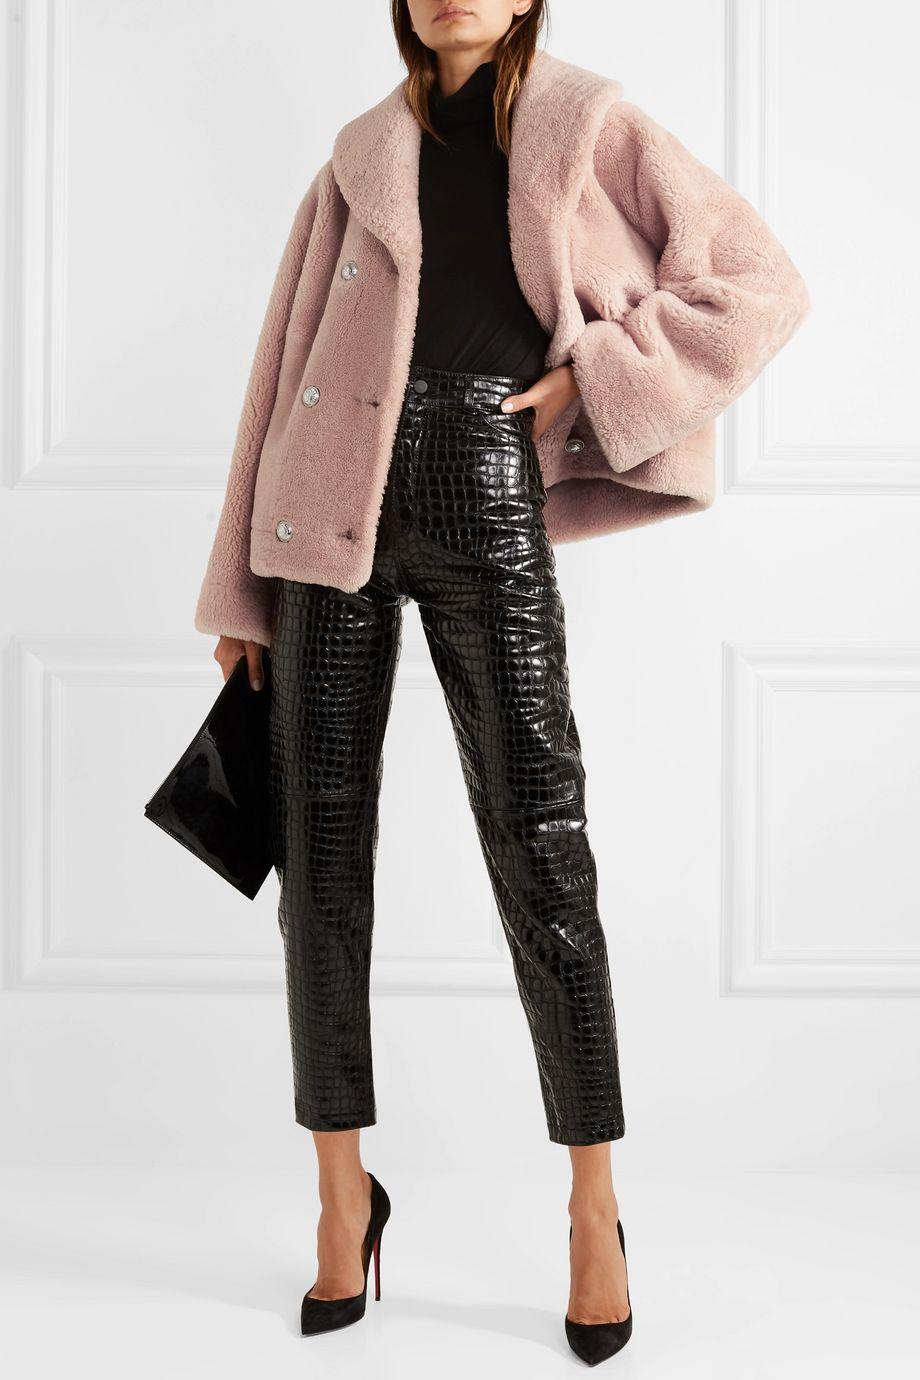 Balmain Double-breasted shearling coat